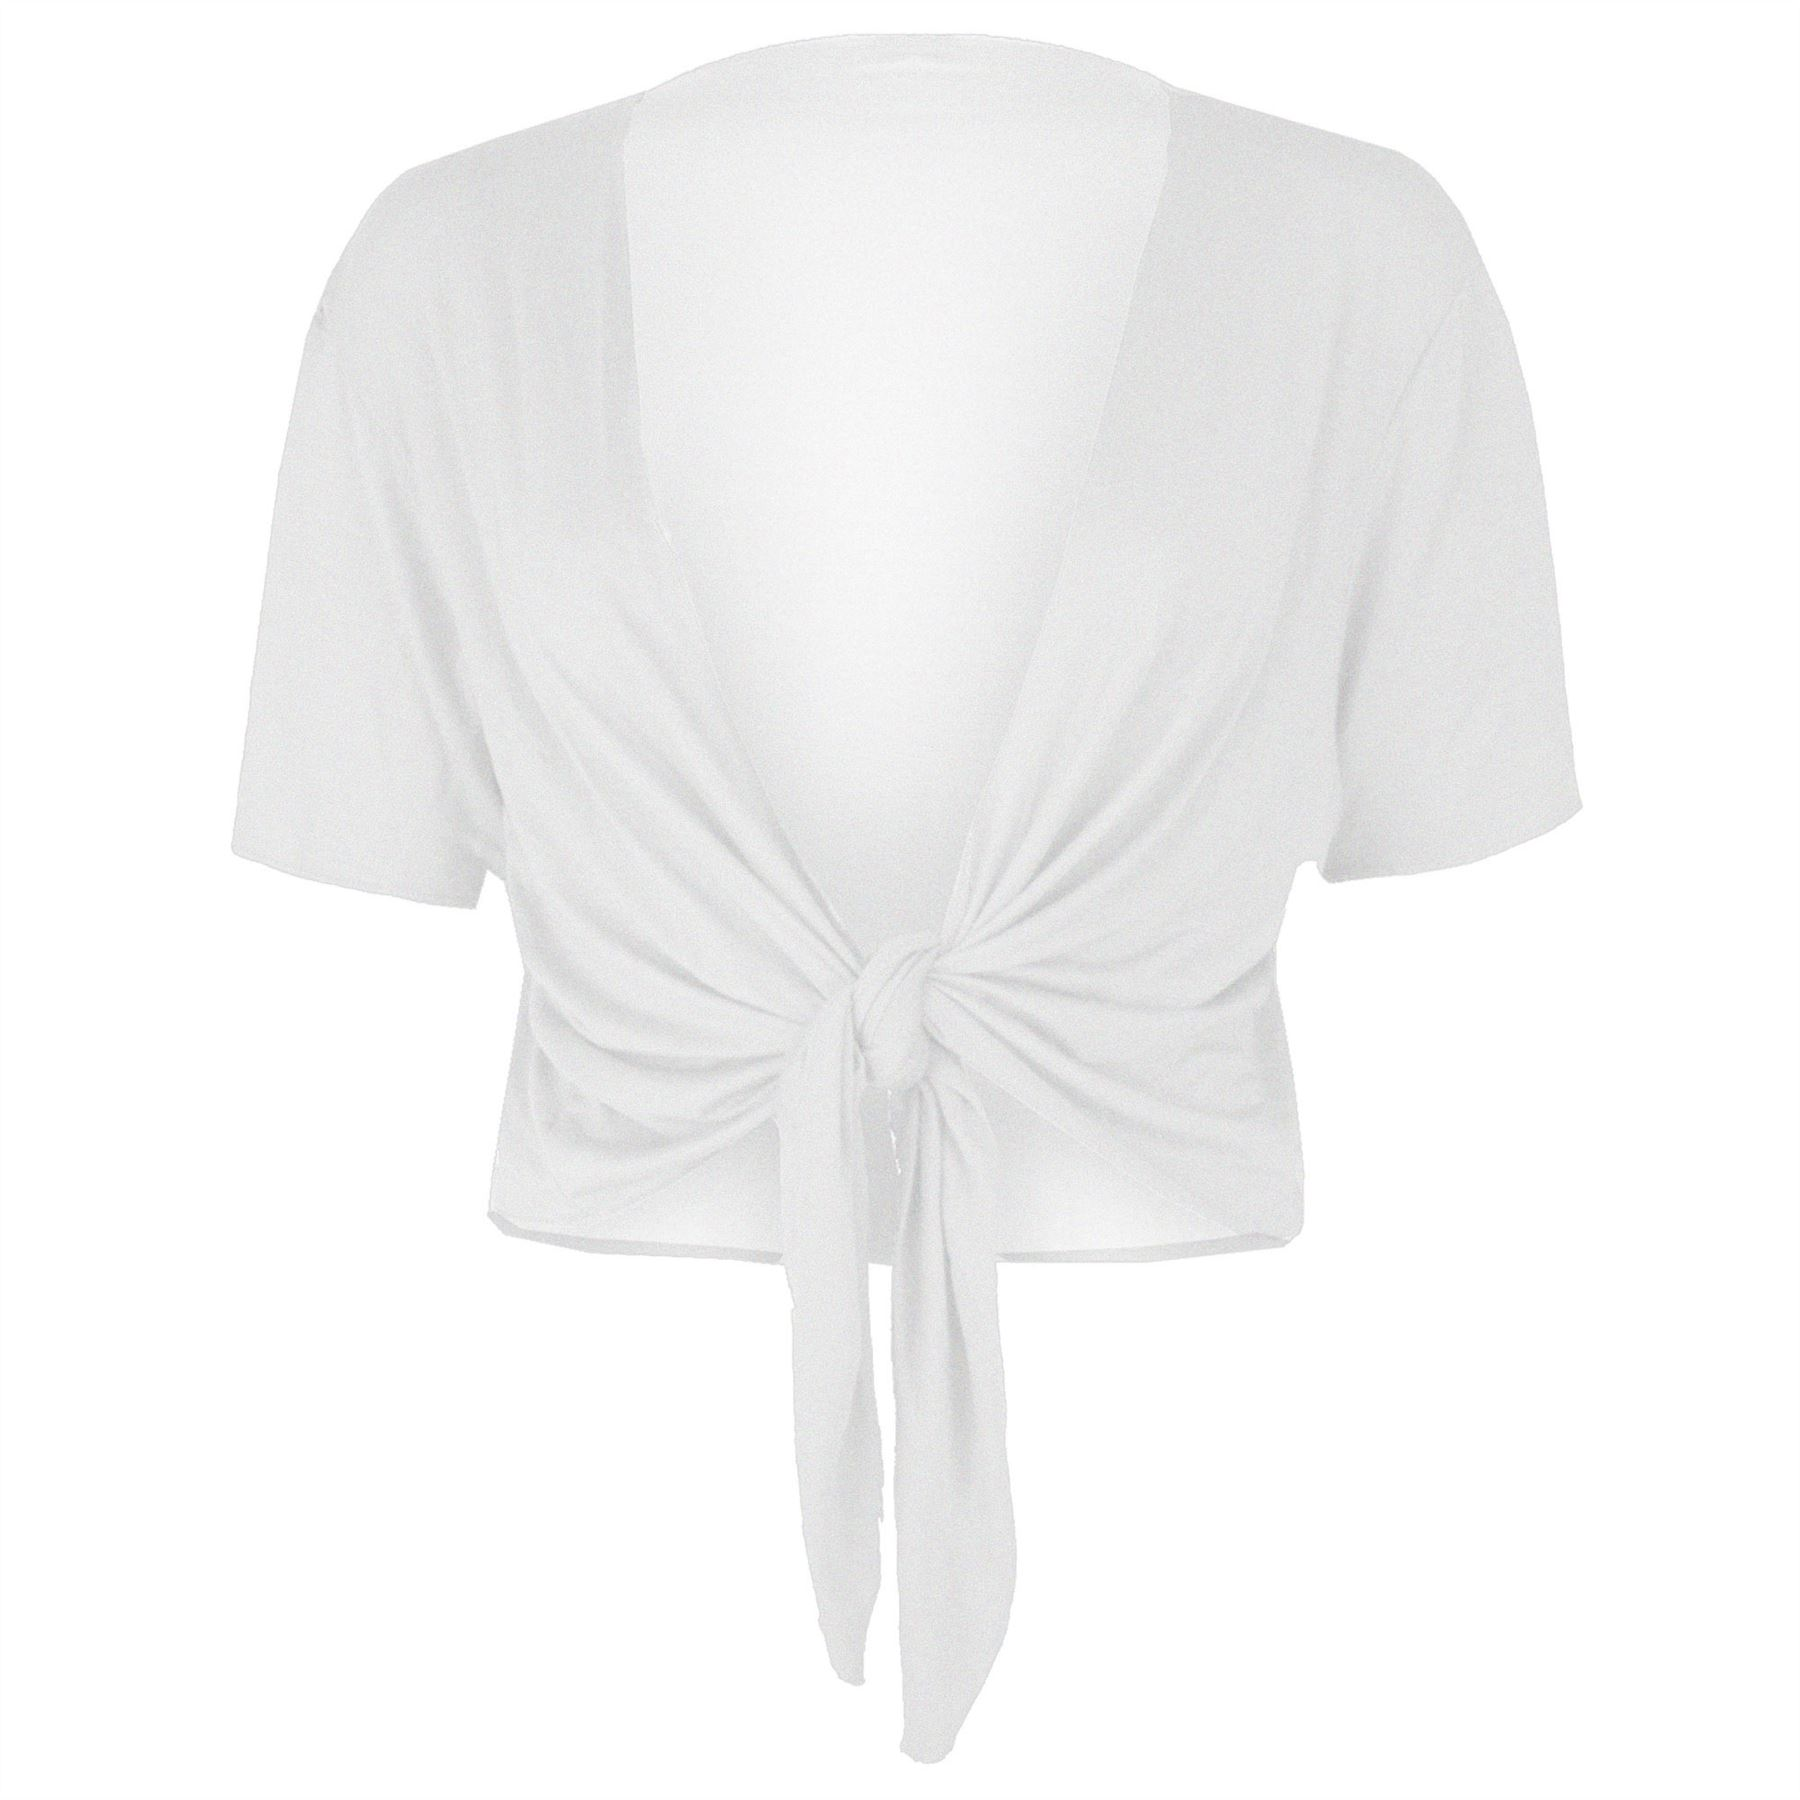 Women's Ladies Cap Sleeve Plain Bolero Shrug Top Cardigan